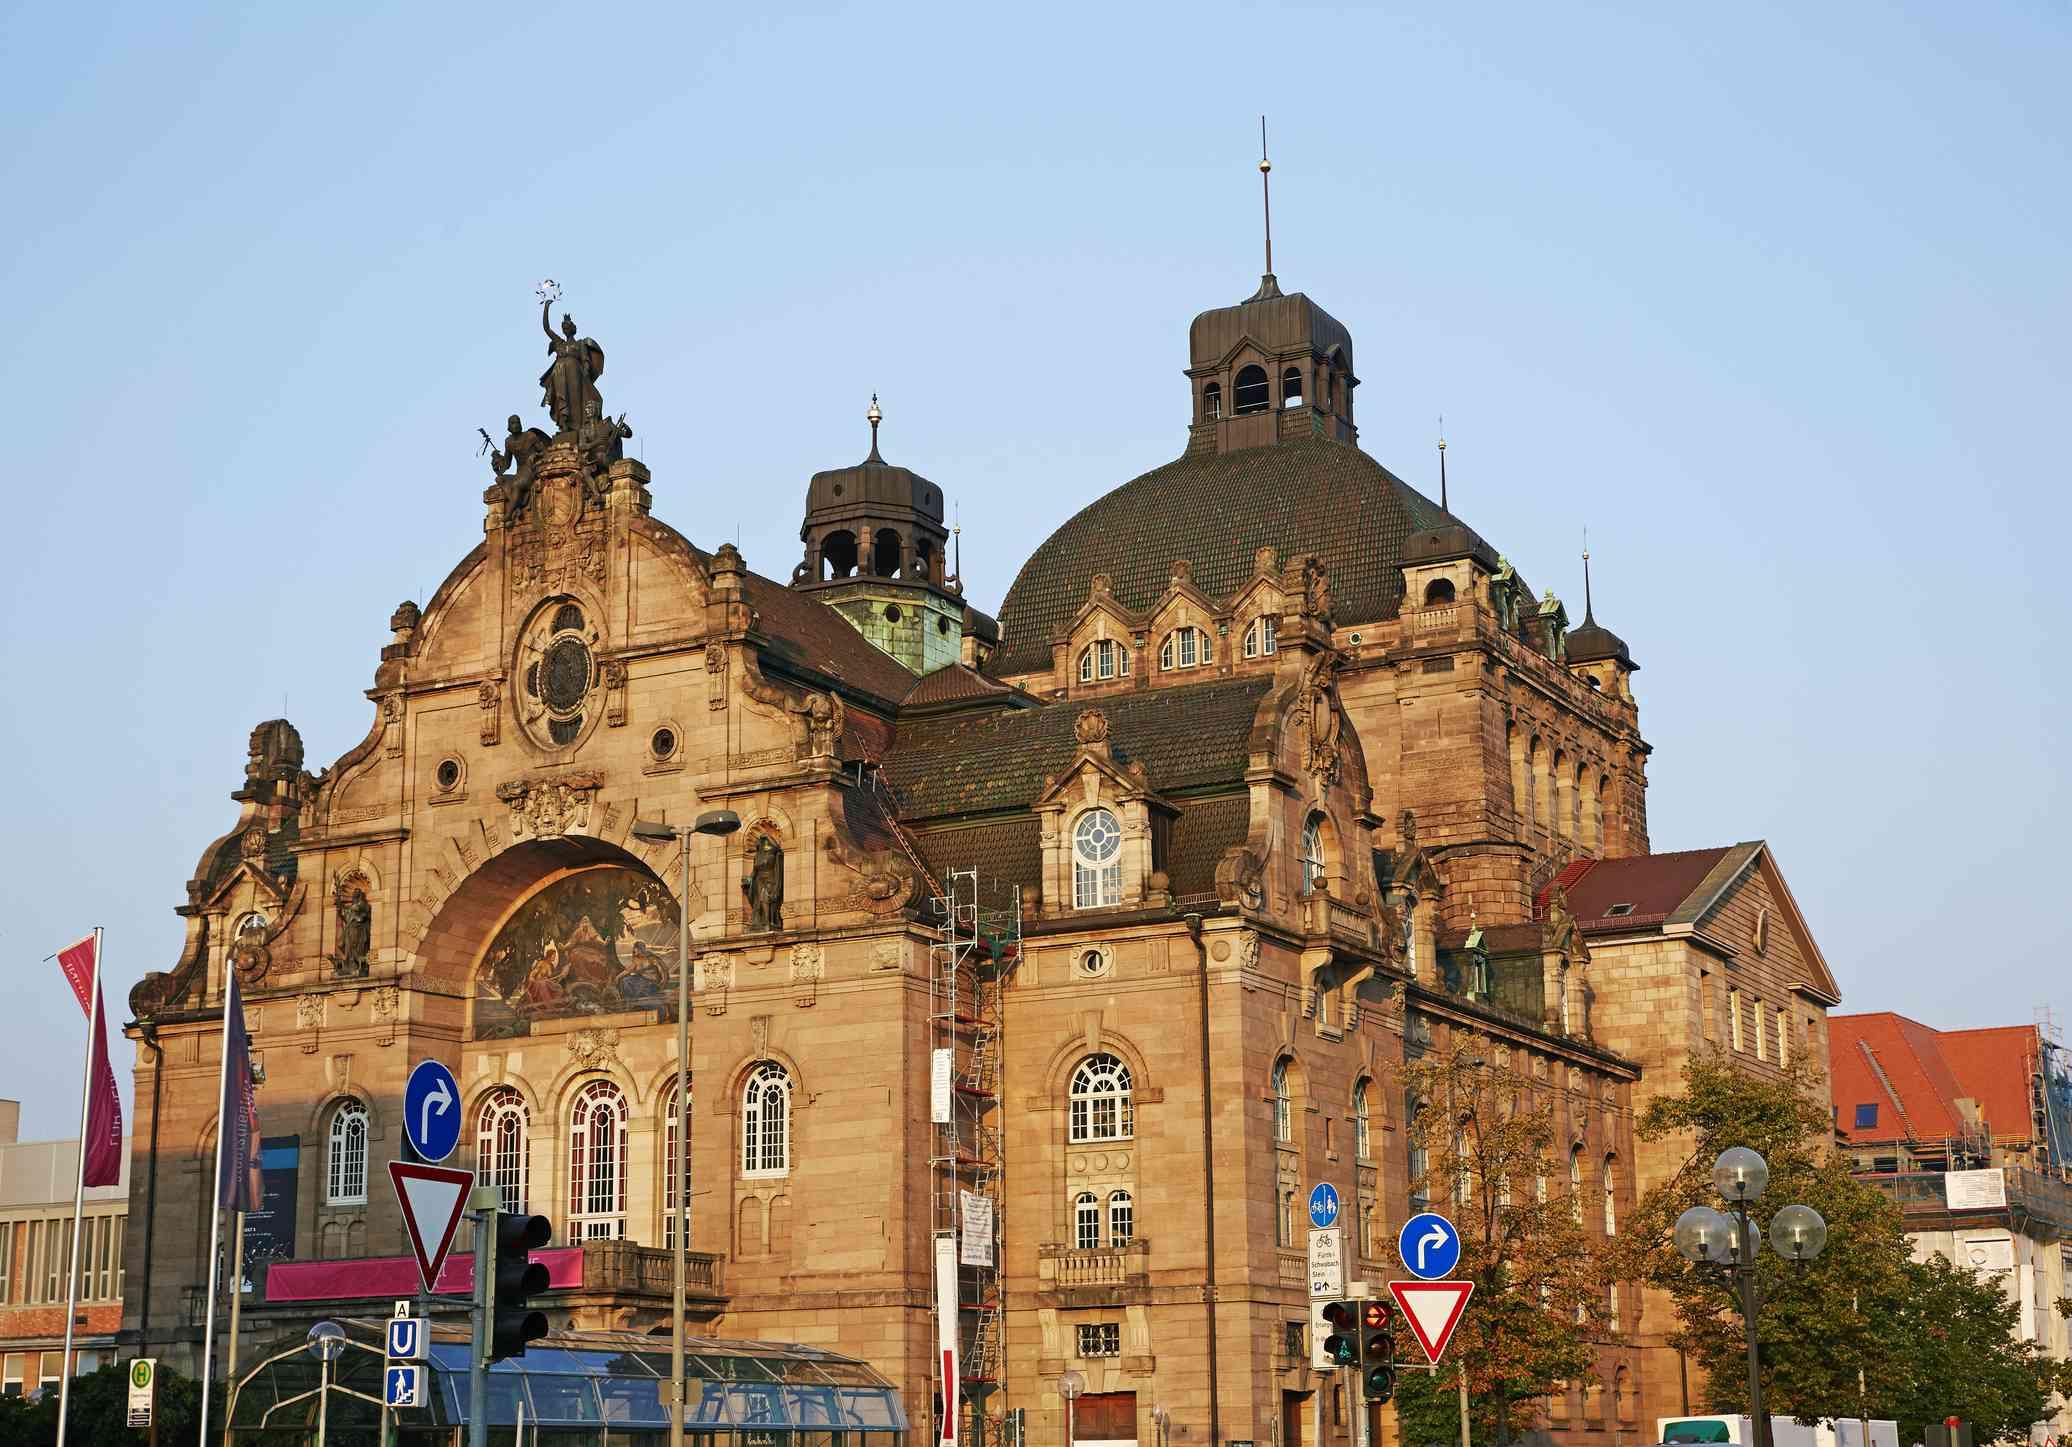 Facade of Nuremberg Opera House